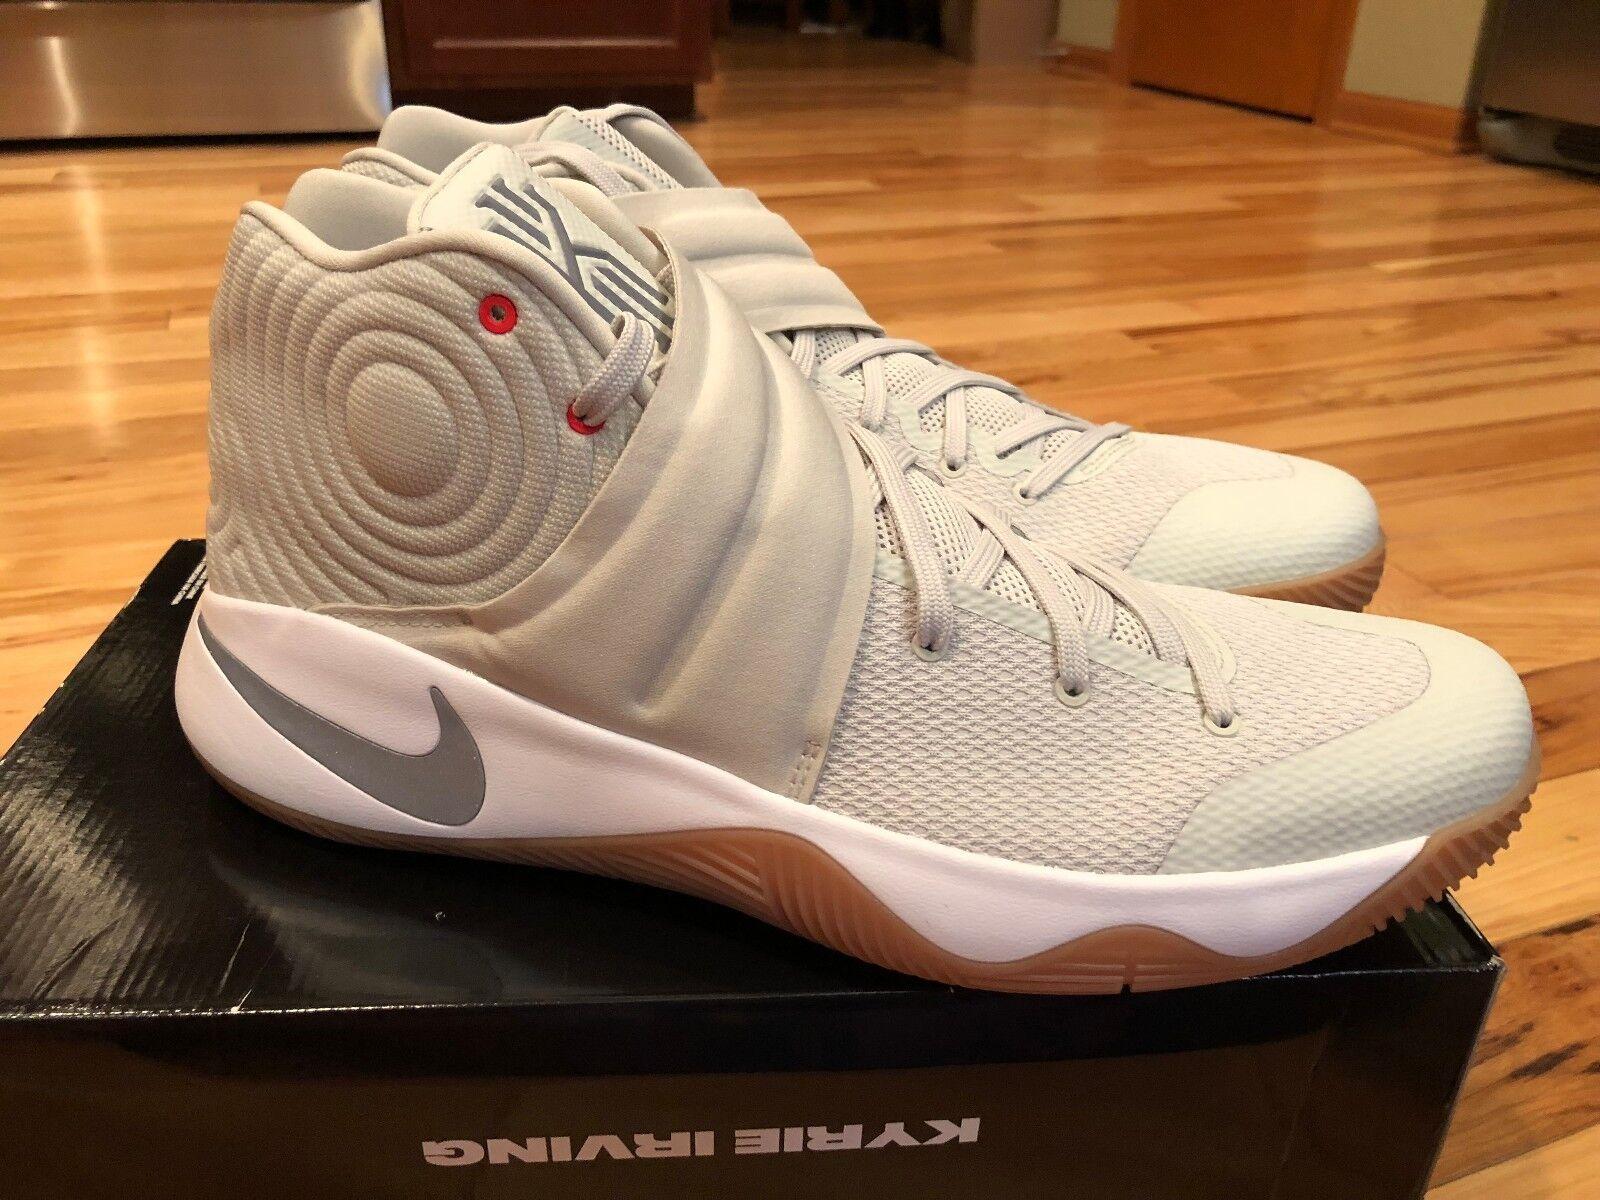 dbe055b3ad93 Nike Kyrie 2 Summer Pack II Men Basketball Shoes Light Bone Silver ...